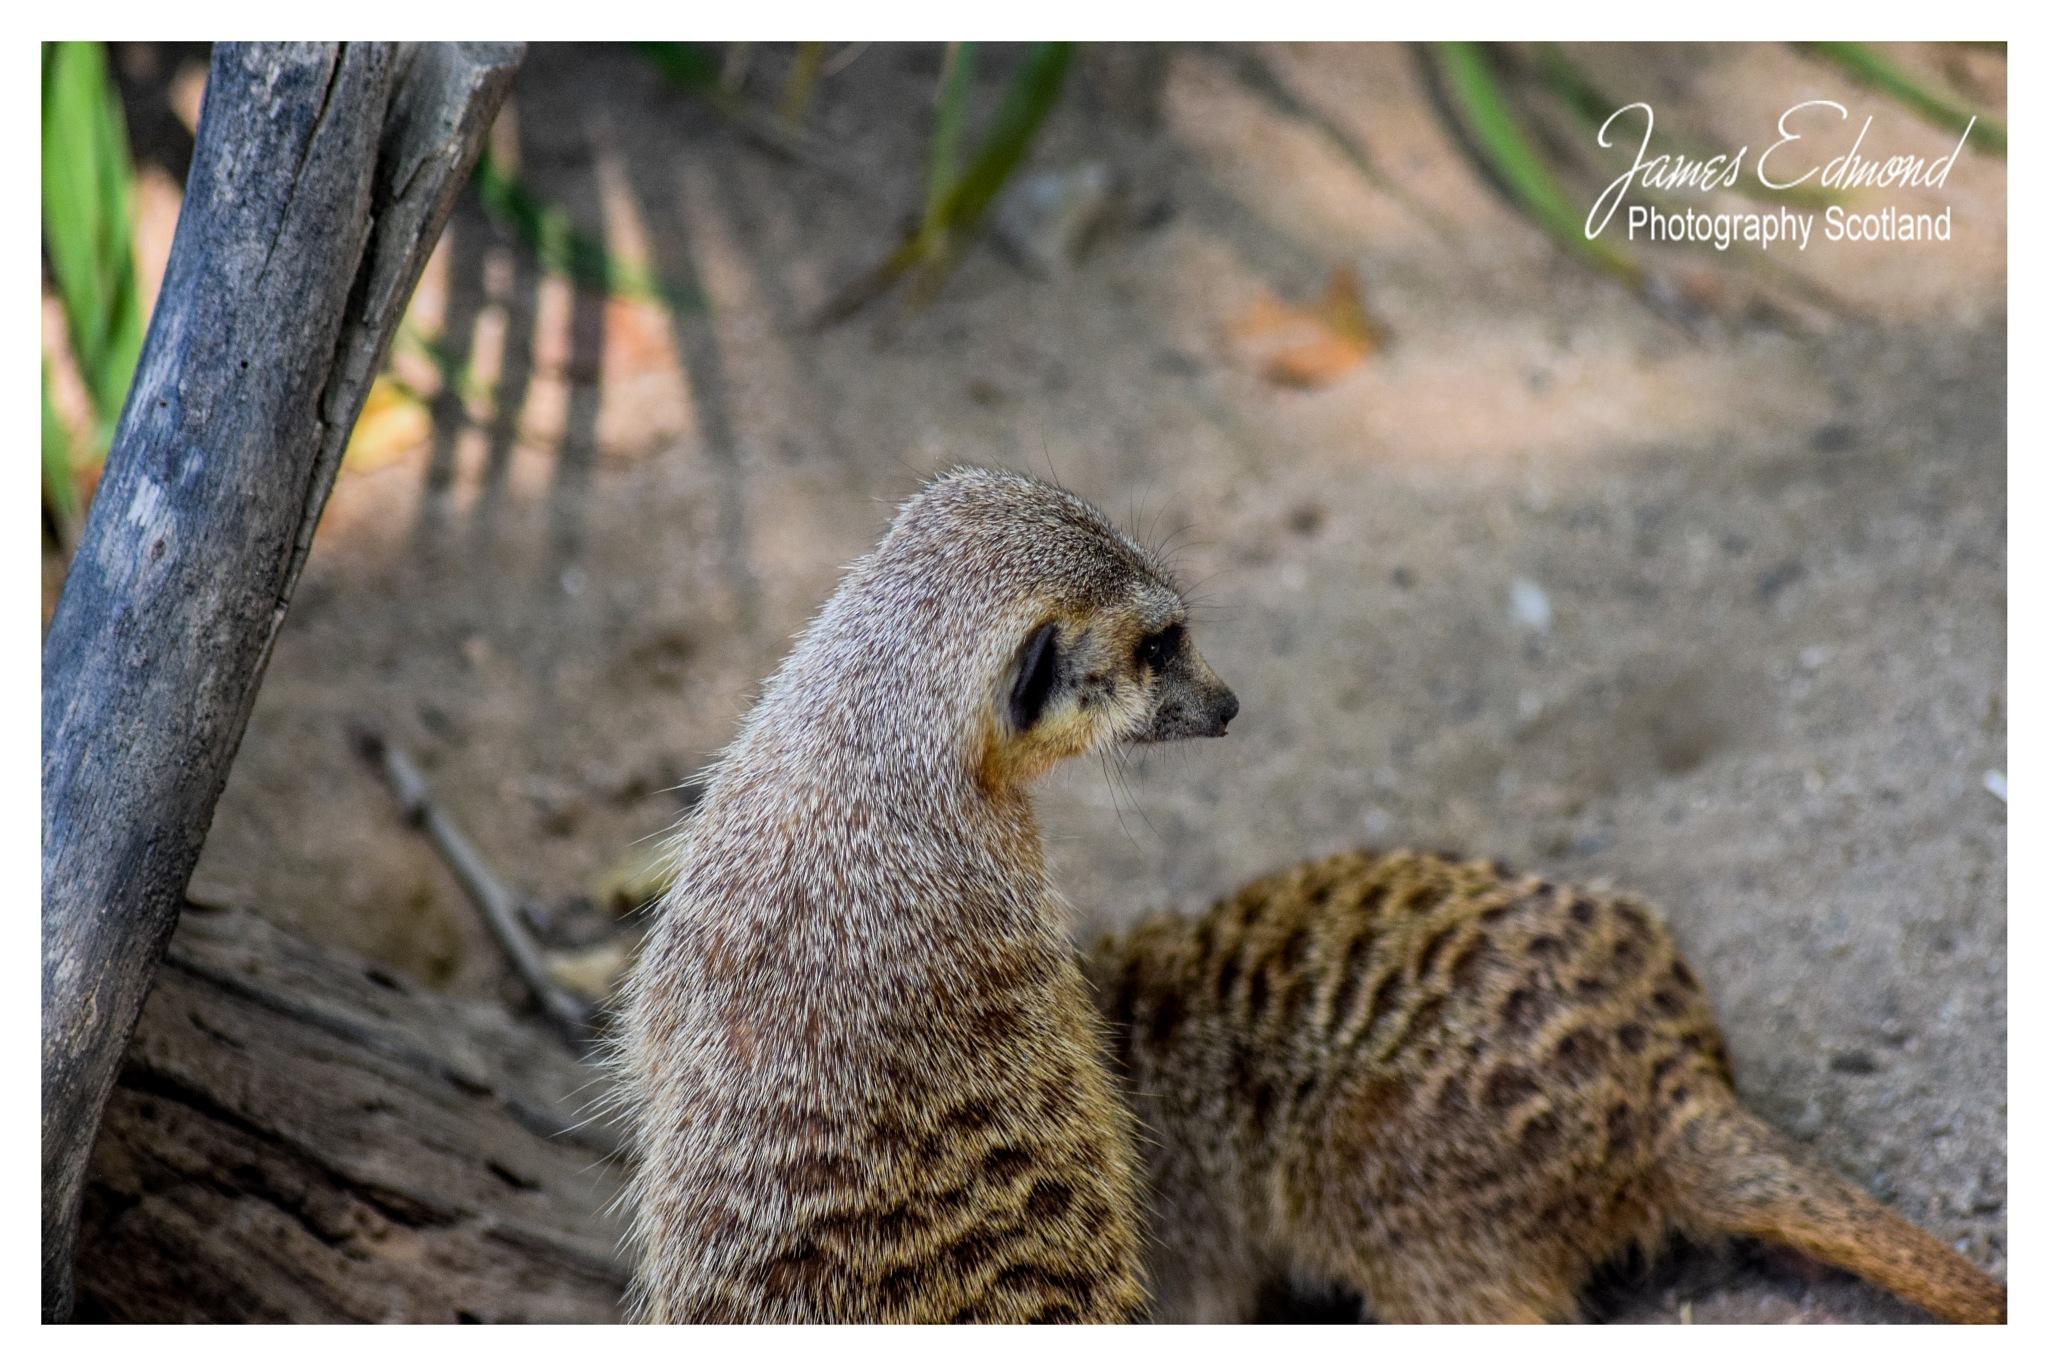 Meerkat  by James Edmond Photography